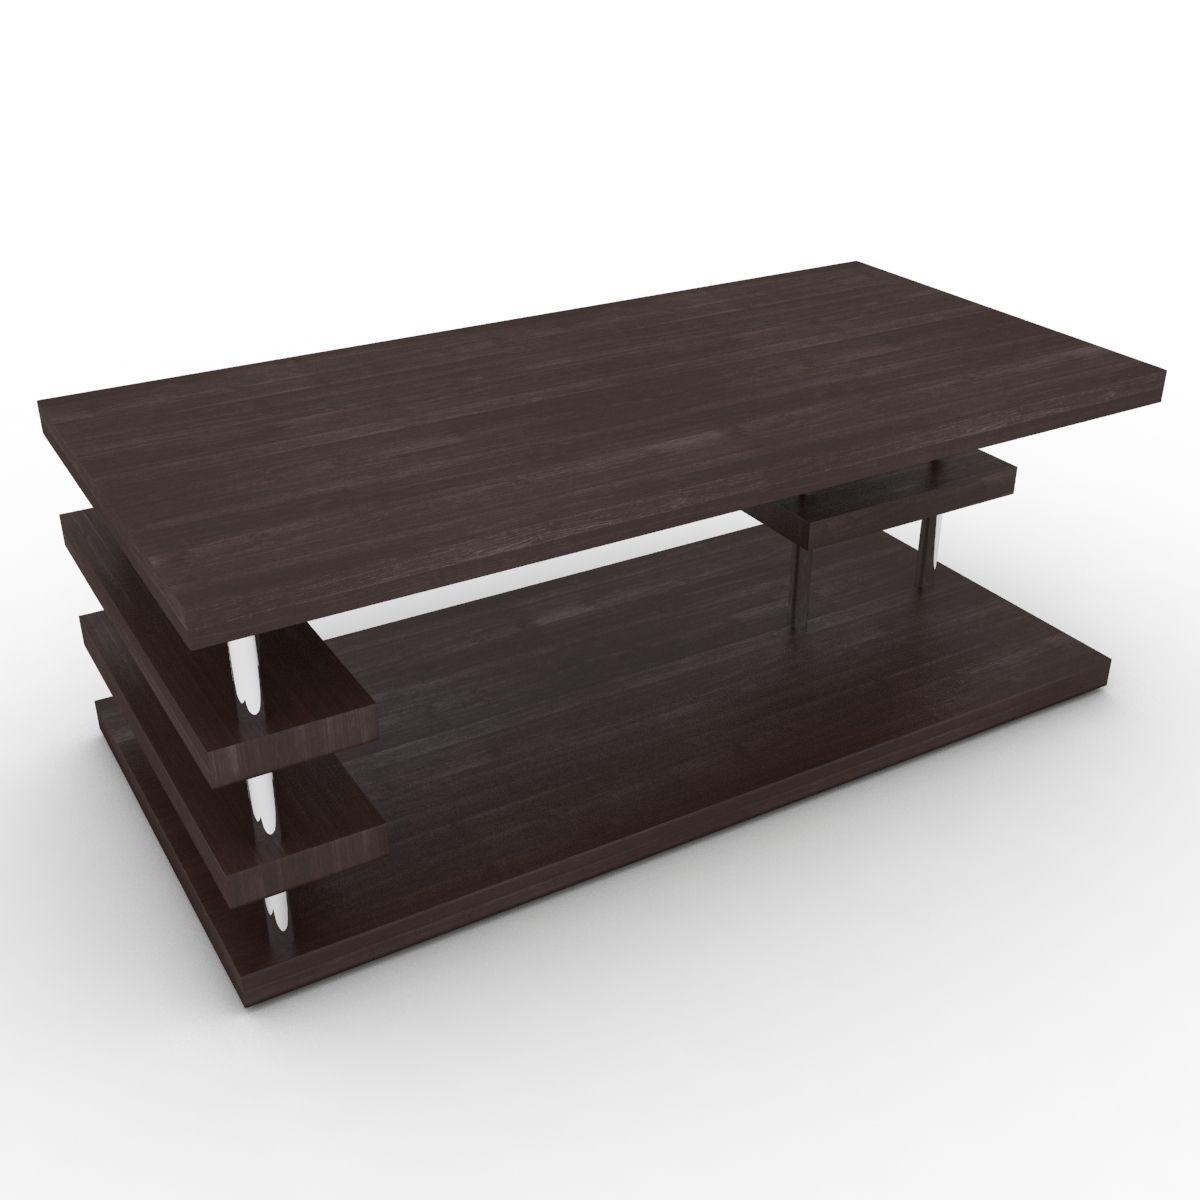 Modern Coffee Table 3d Model Max Obj 3ds Fbx